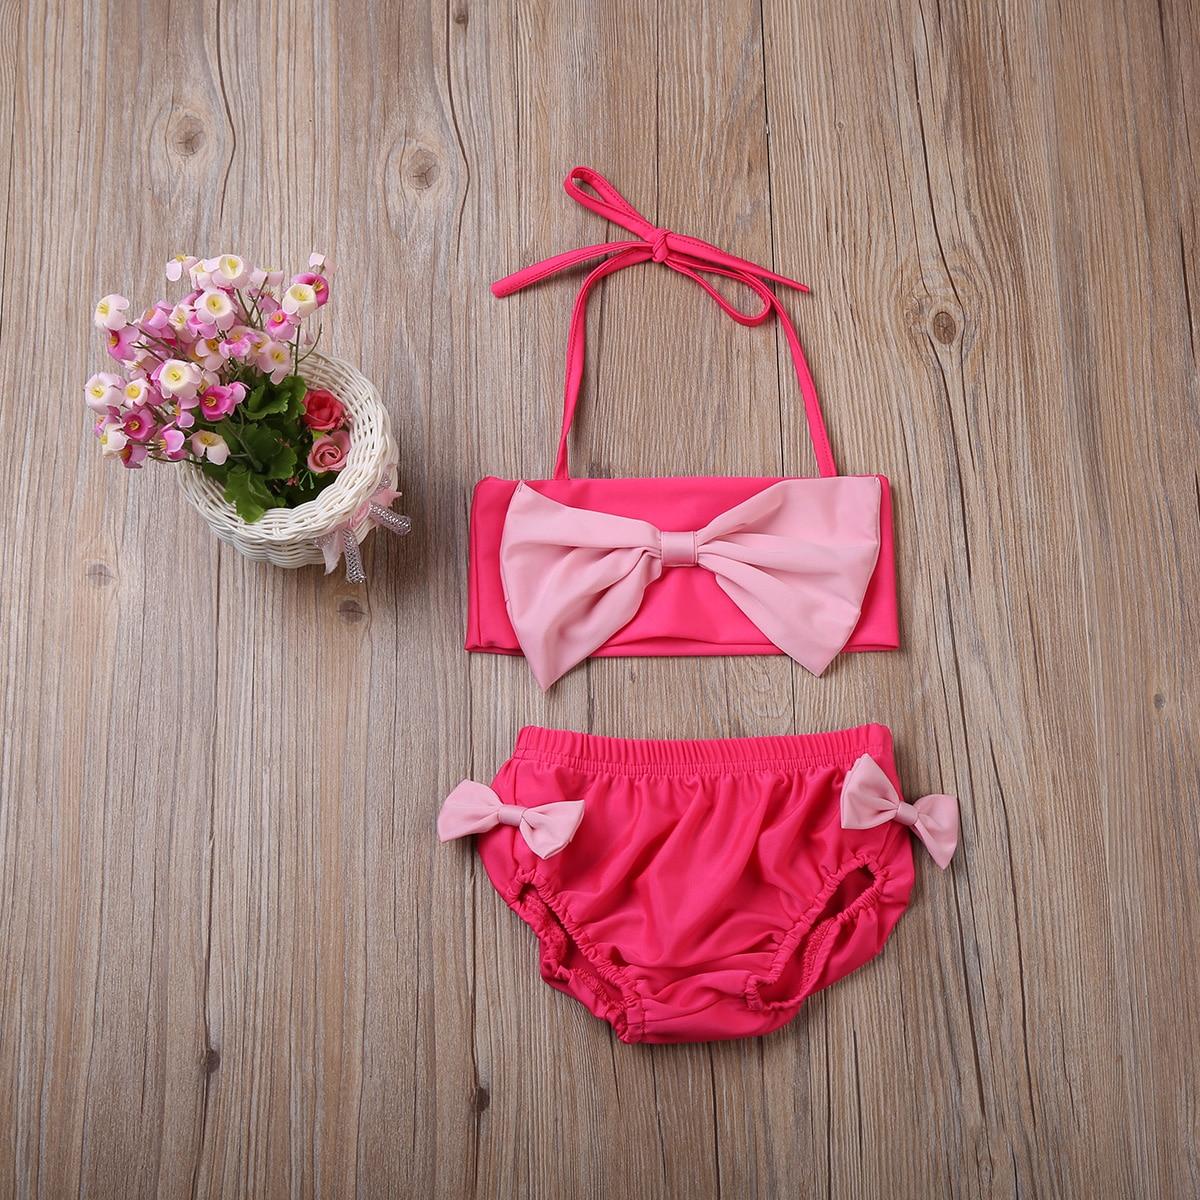 2017 Age 2-7Y 2PCS Baby Girls Summer Pink Swimwear Kids Children Swimsuit Bikinis Set Cute Bow Swimsuit Global Free Shipping New